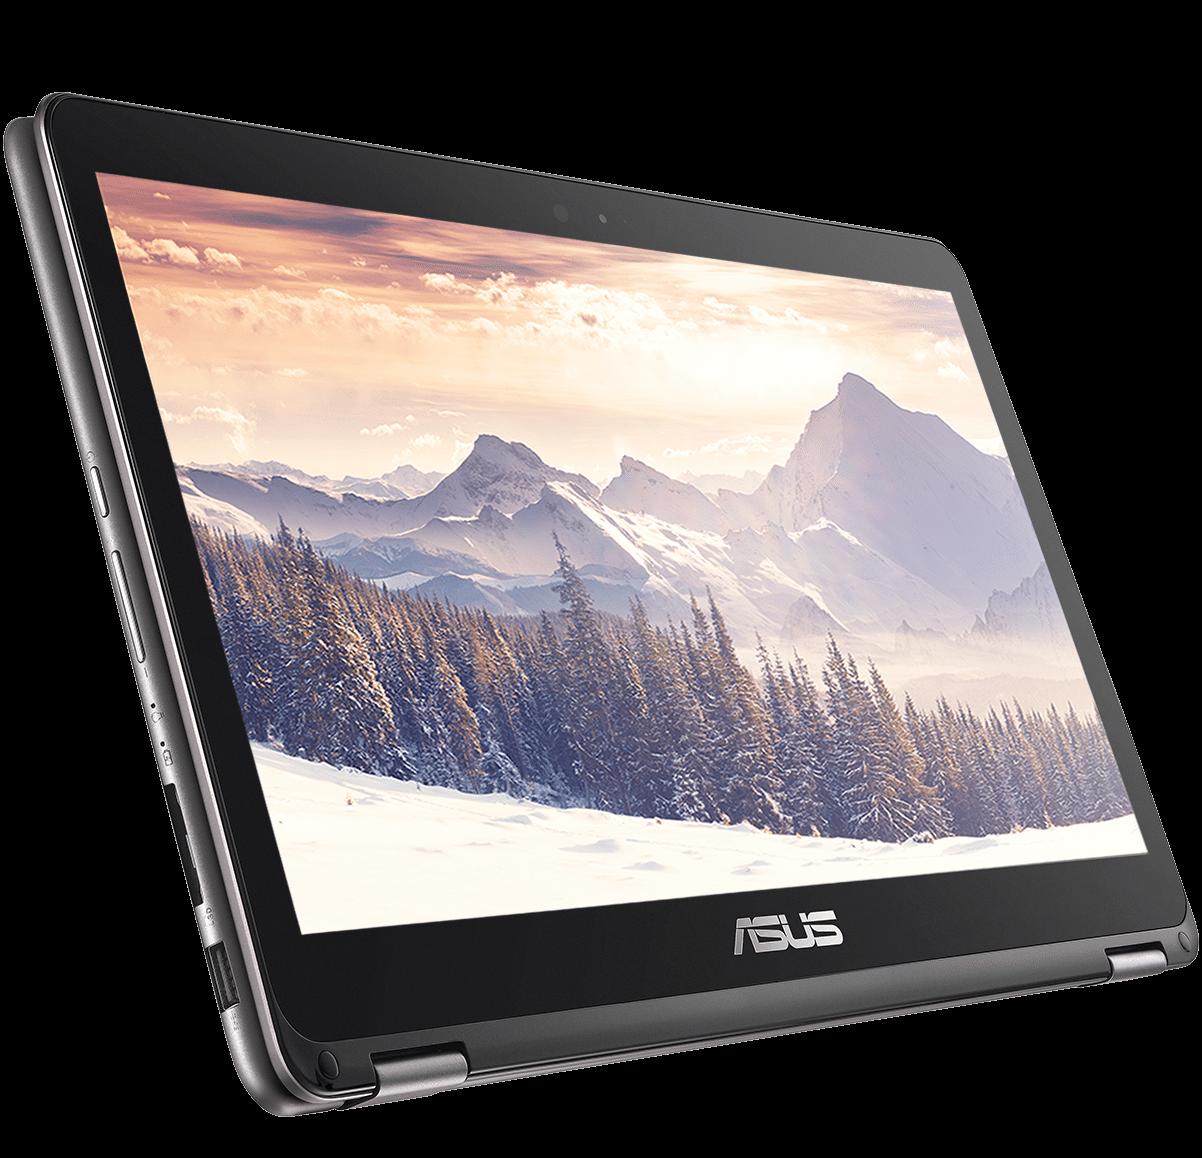 ASUS ZenBook Flip_UX360CA_QHD 3K display_Tablet mode